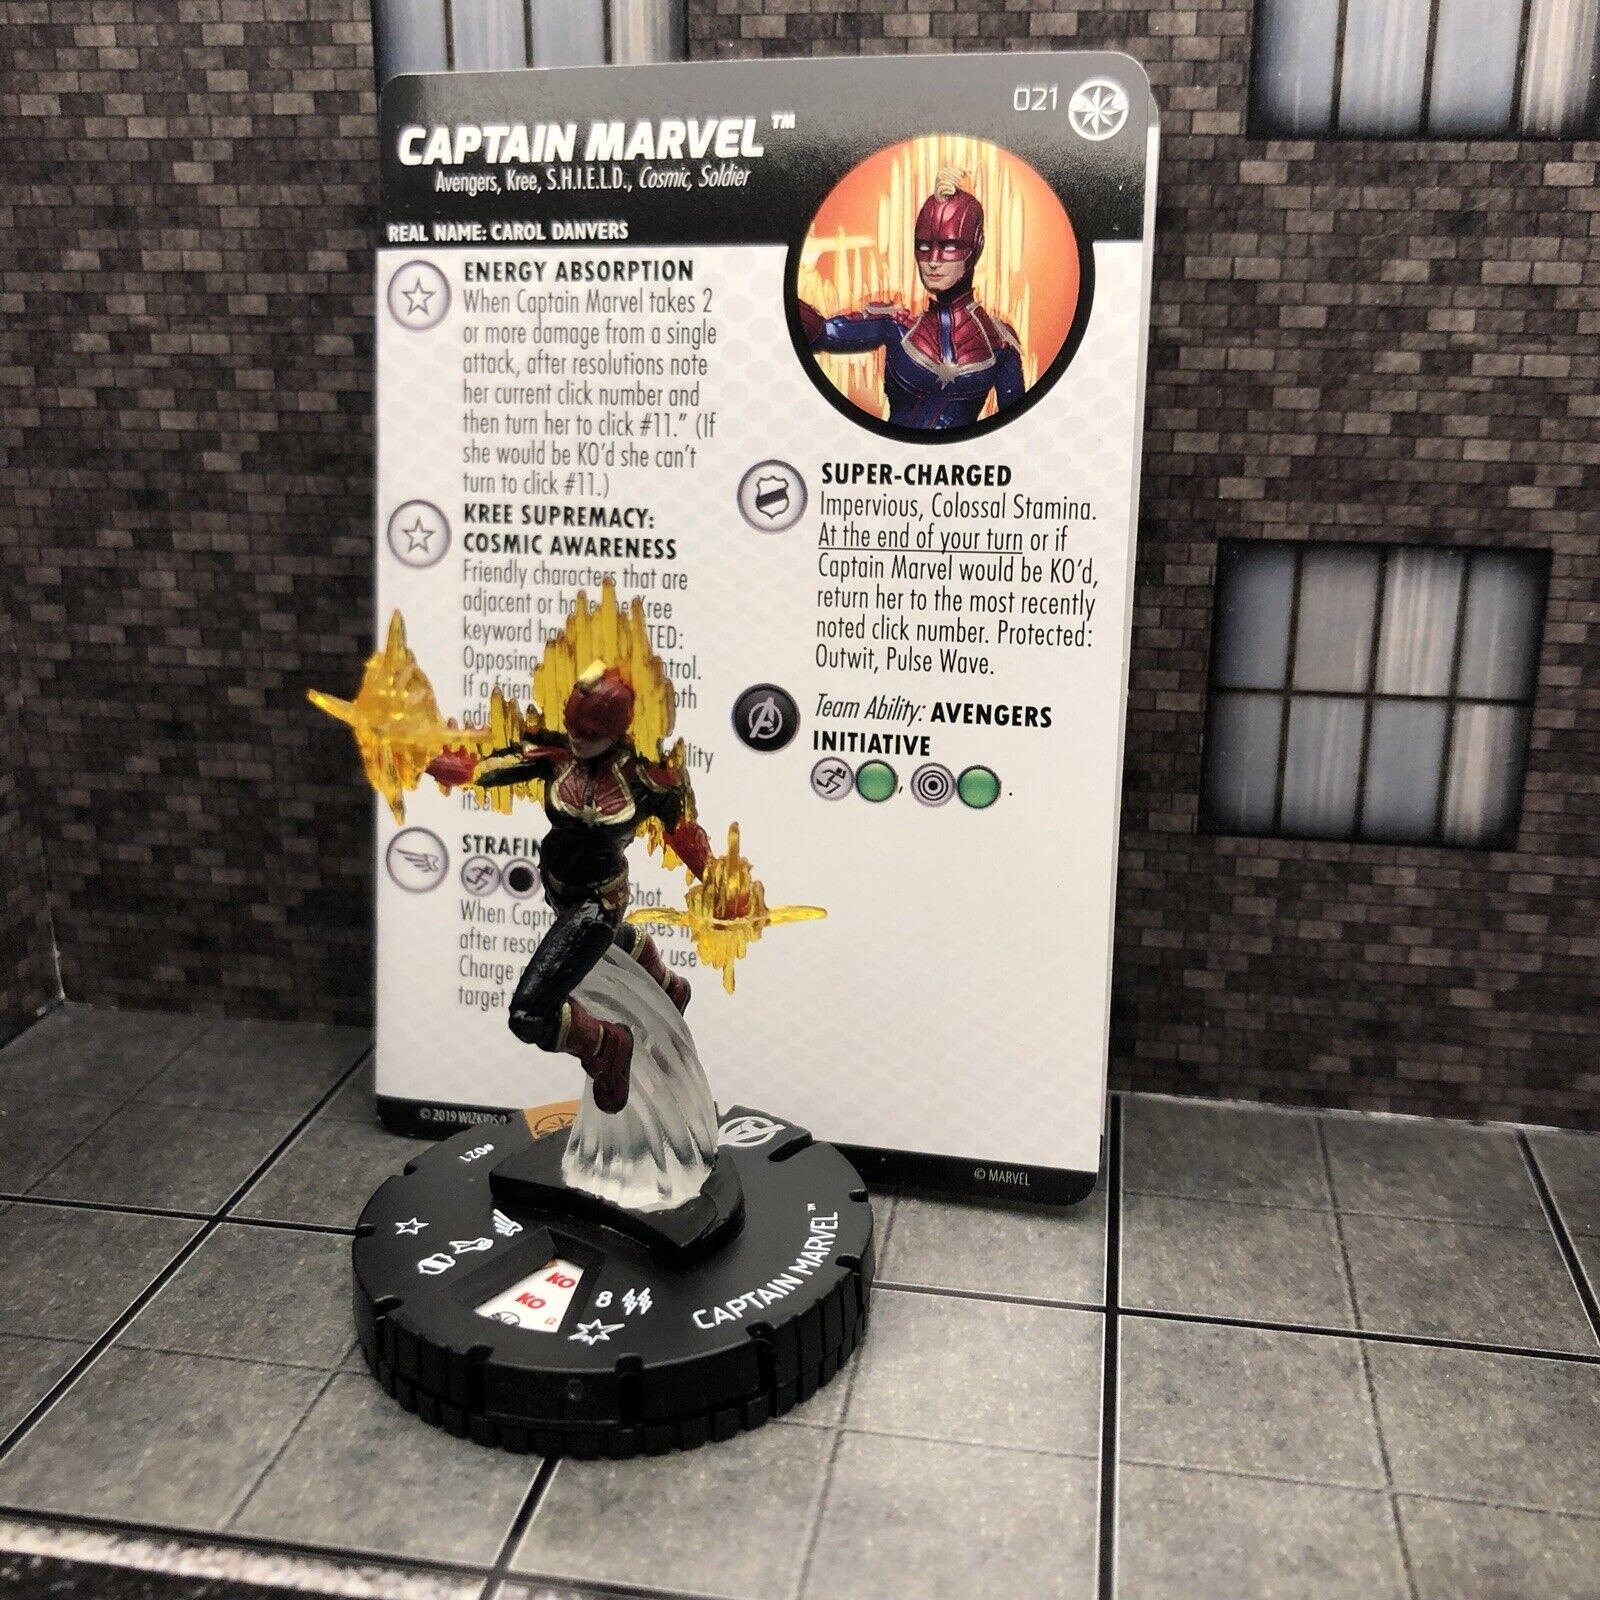 HEROCLIX Captain Marvel Movie CHASE